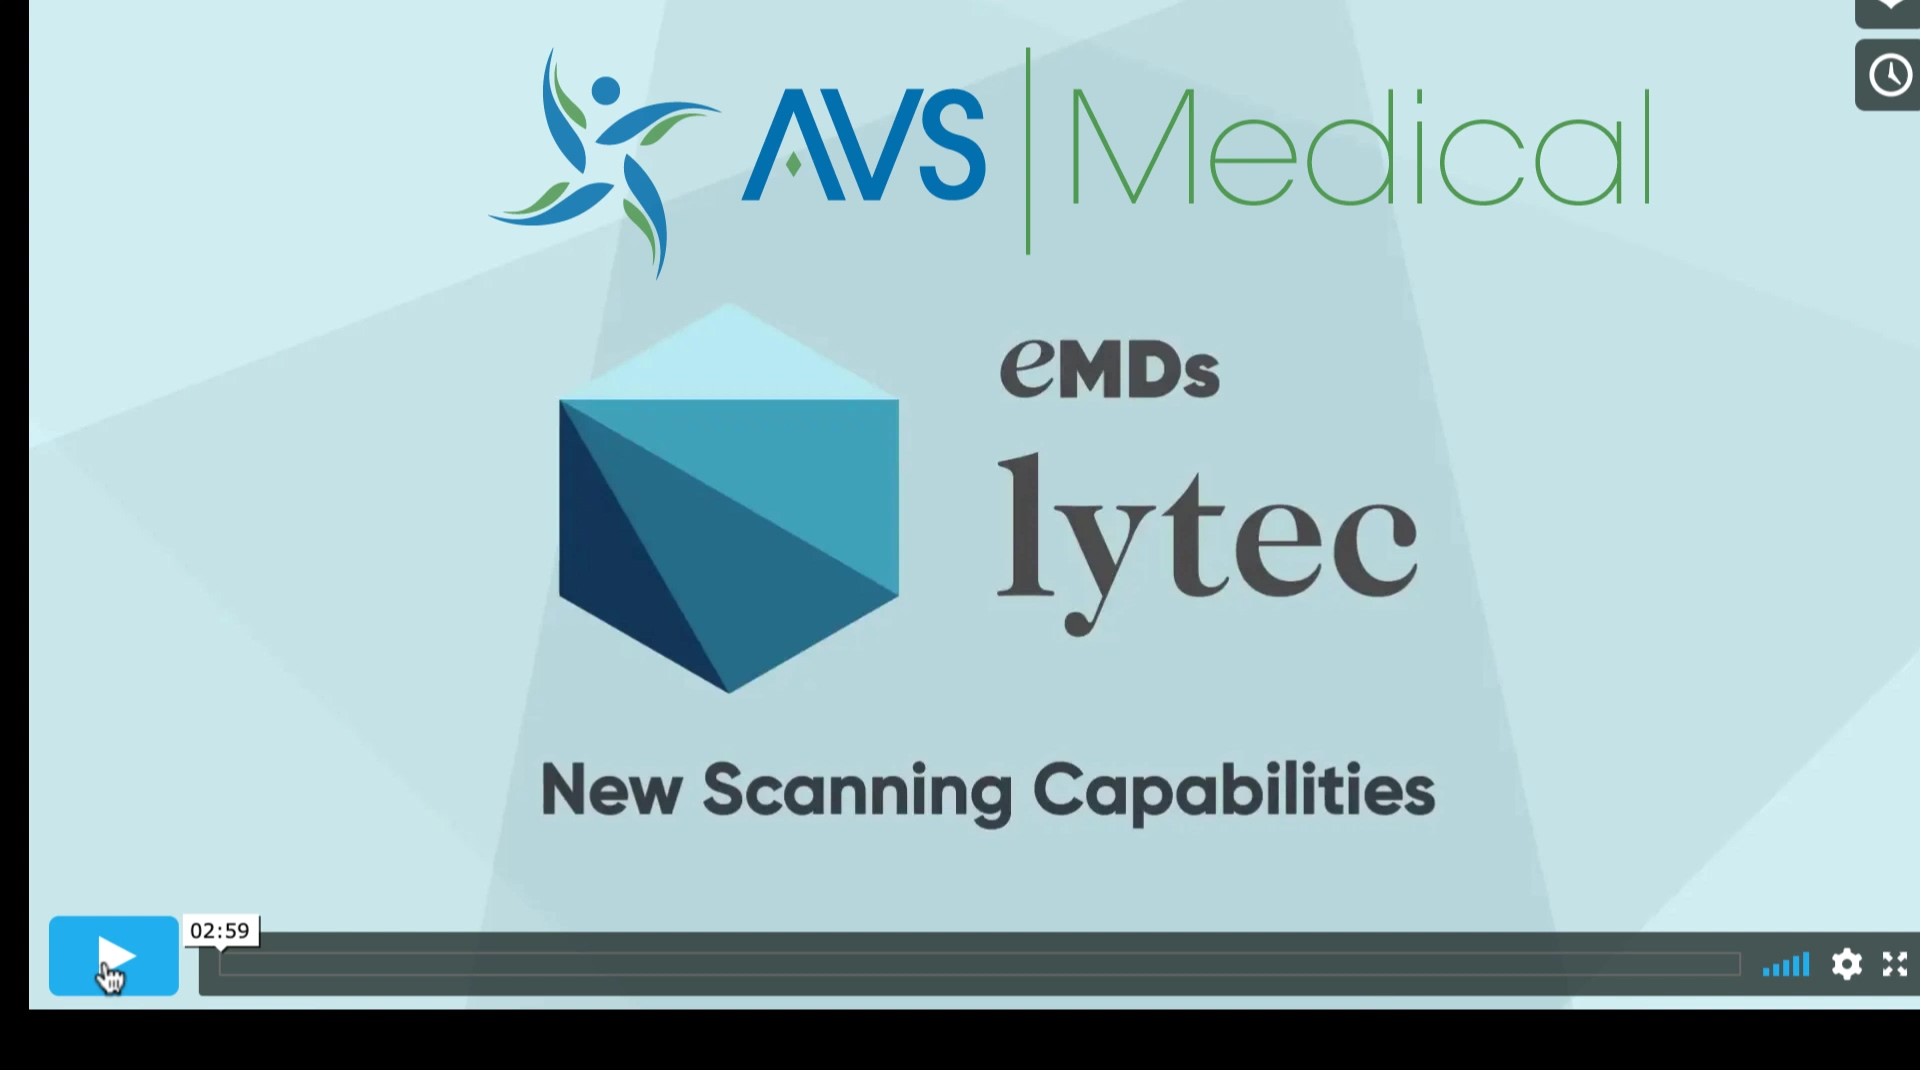 Lytec 2020 New Scanning Capabilities